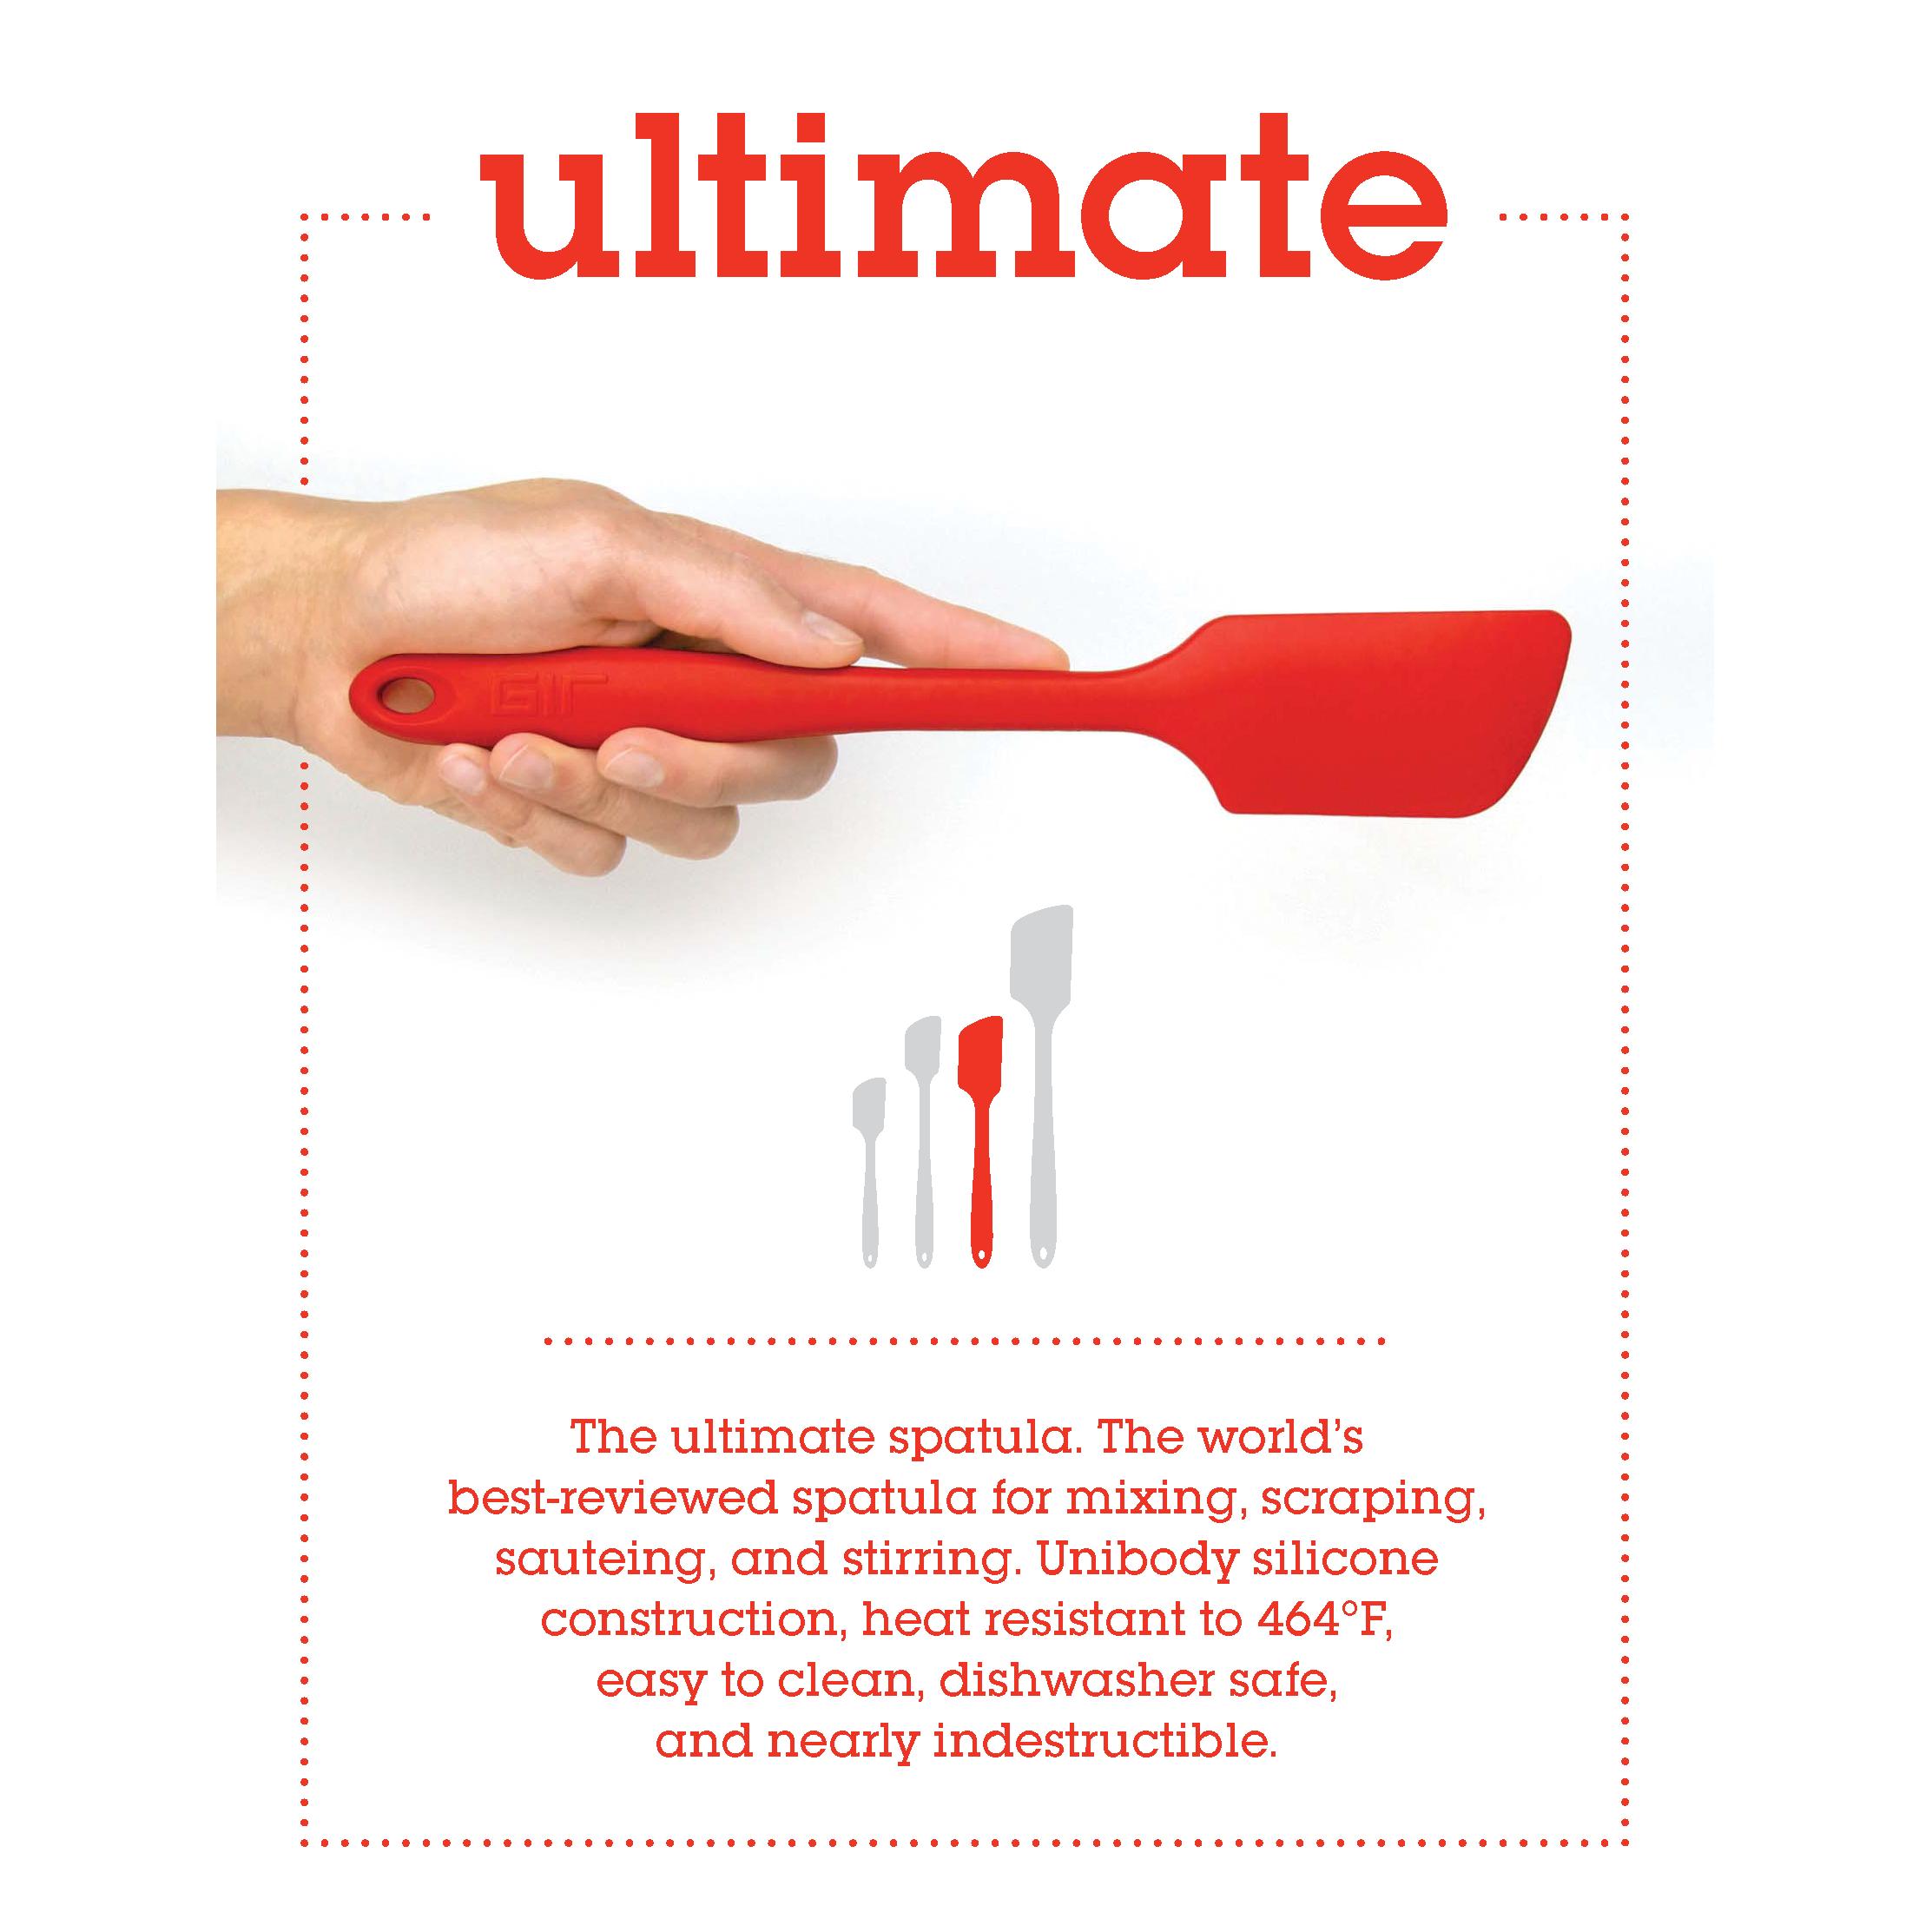 GIR Ultimate spatula keukengerei siliconen bpa-vrij spatel bakspatel